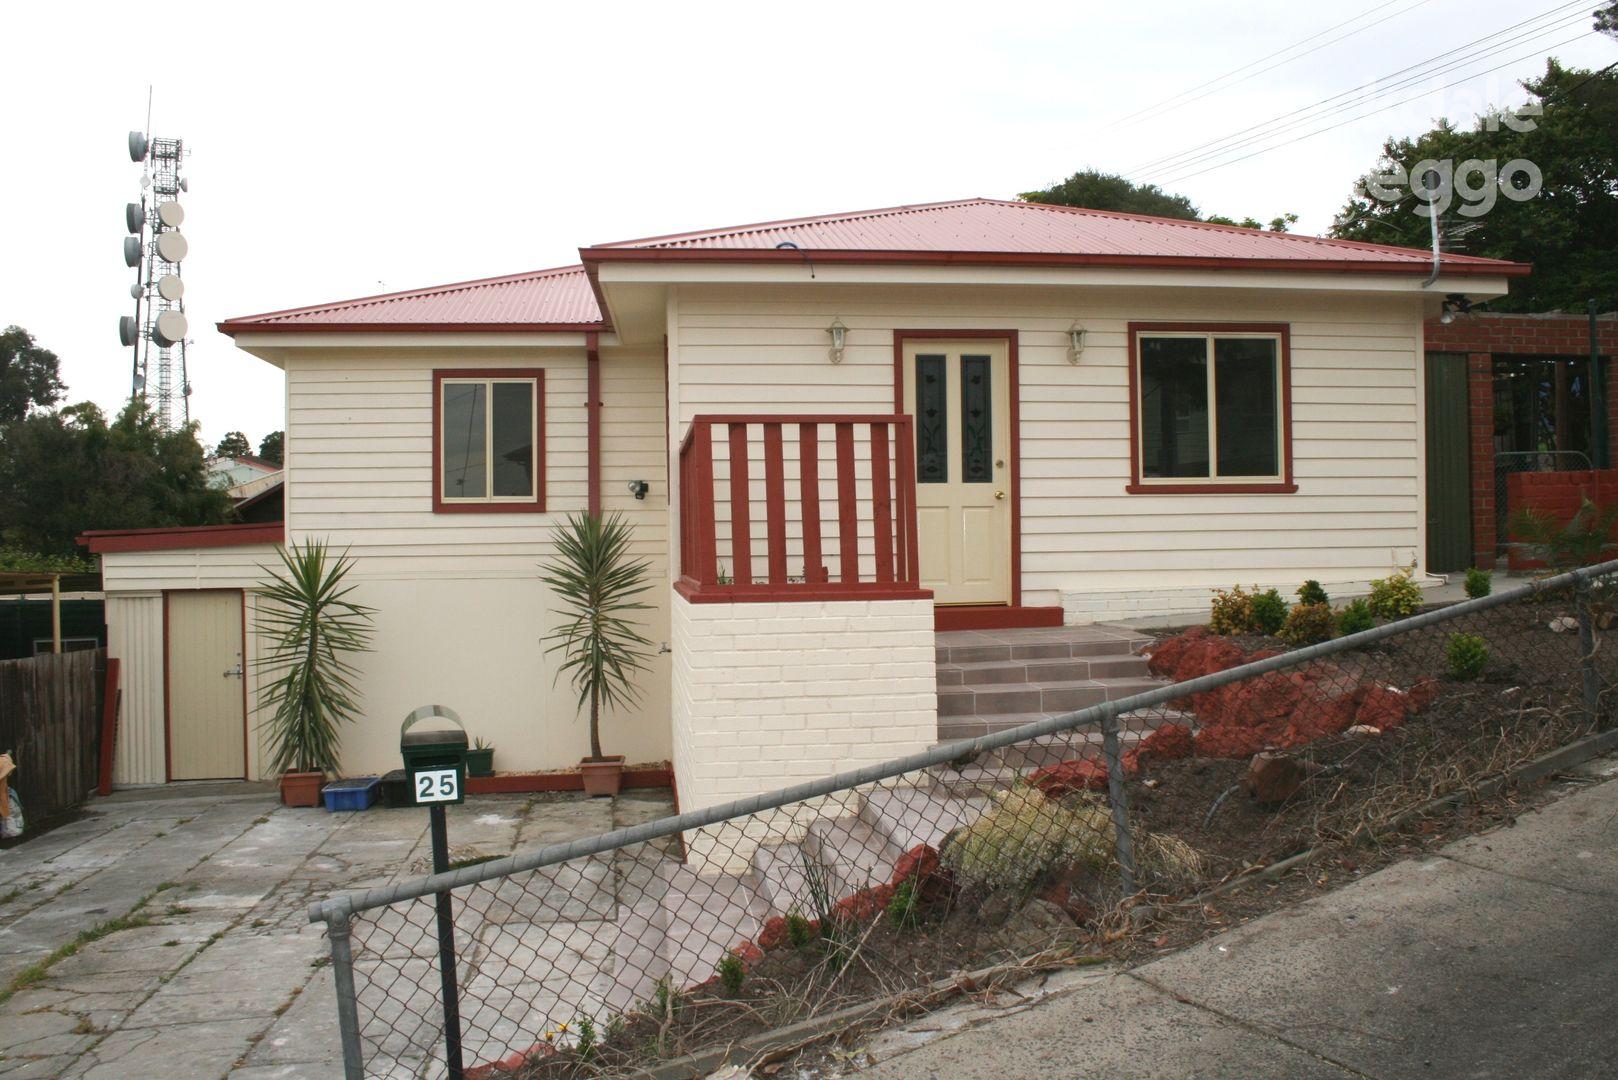 25 Tobruk Street, Morwell VIC 3840, Image 0